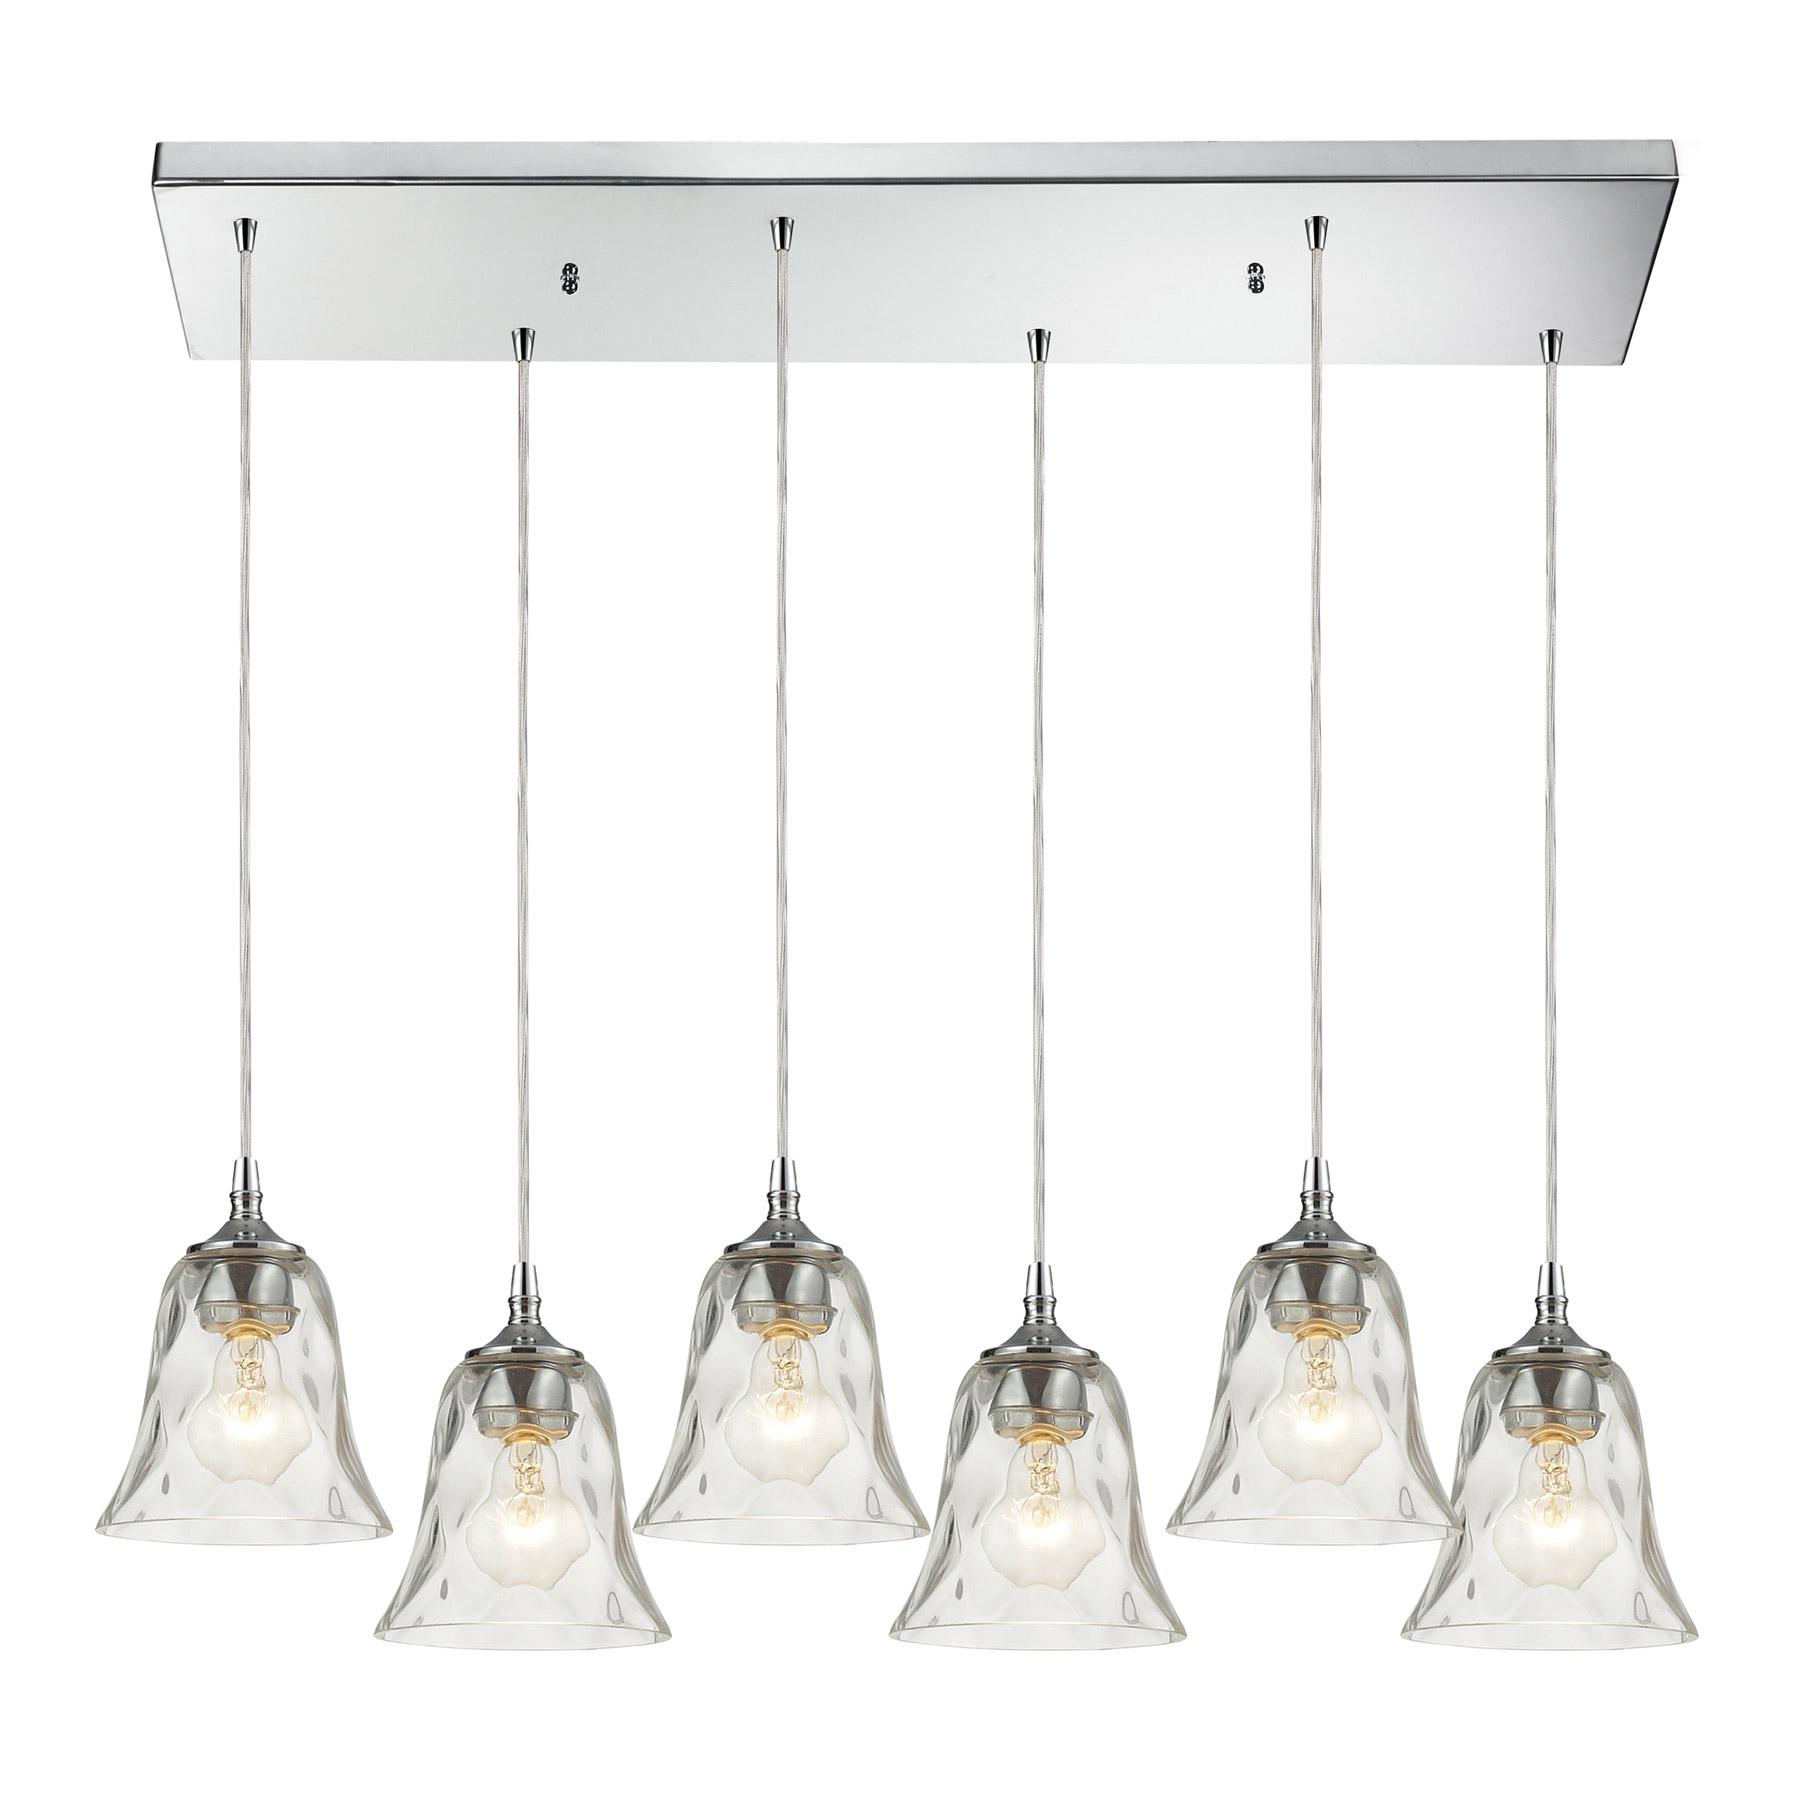 elk lighting 46010 6rc darien 6 light multi pendant ceiling fixture